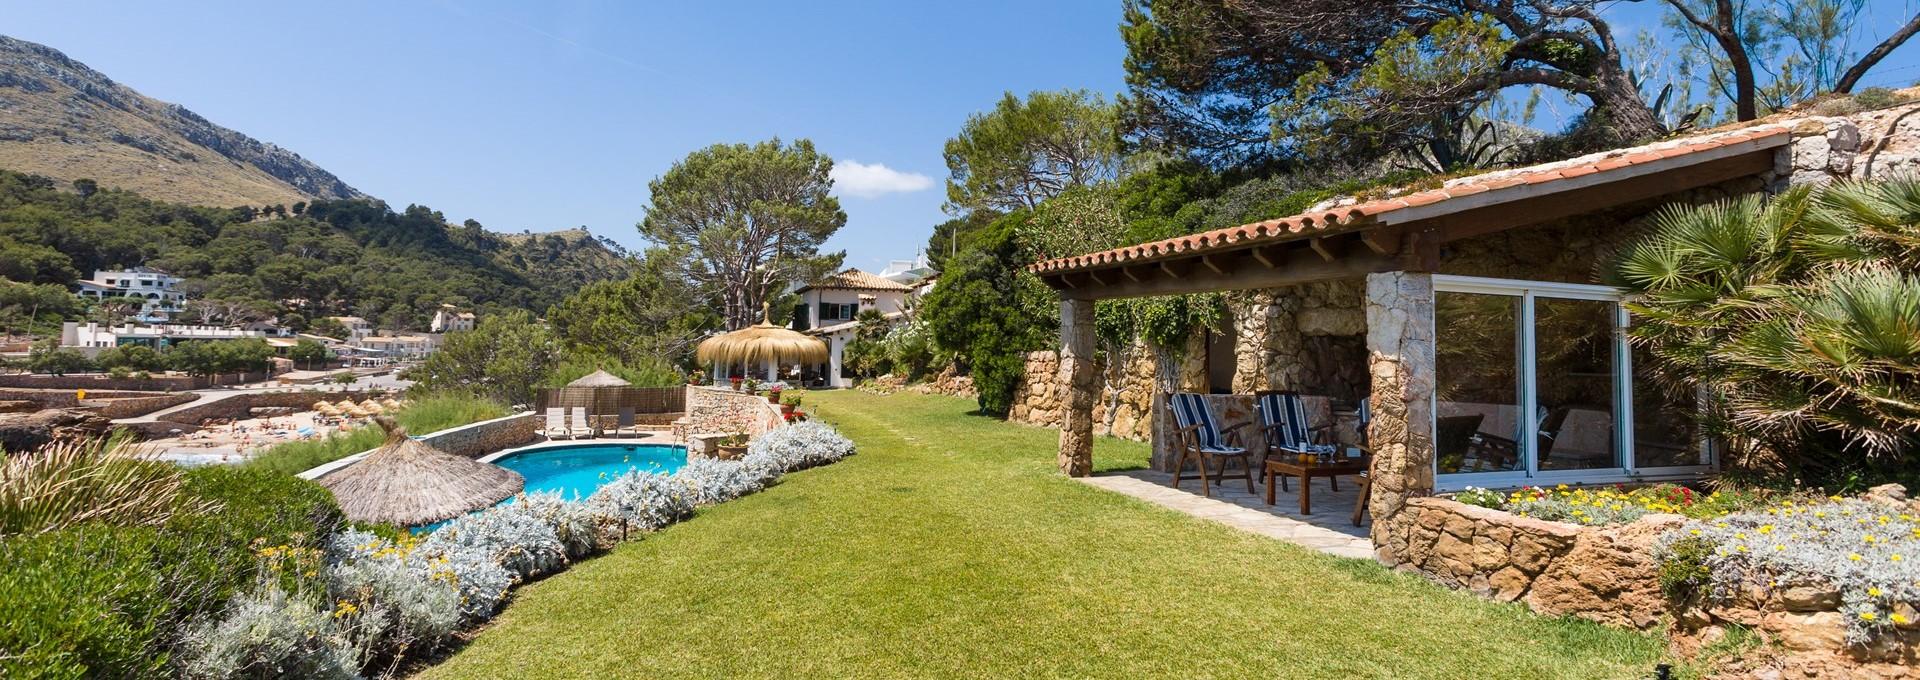 5-bedroom-family-villa-mallorca